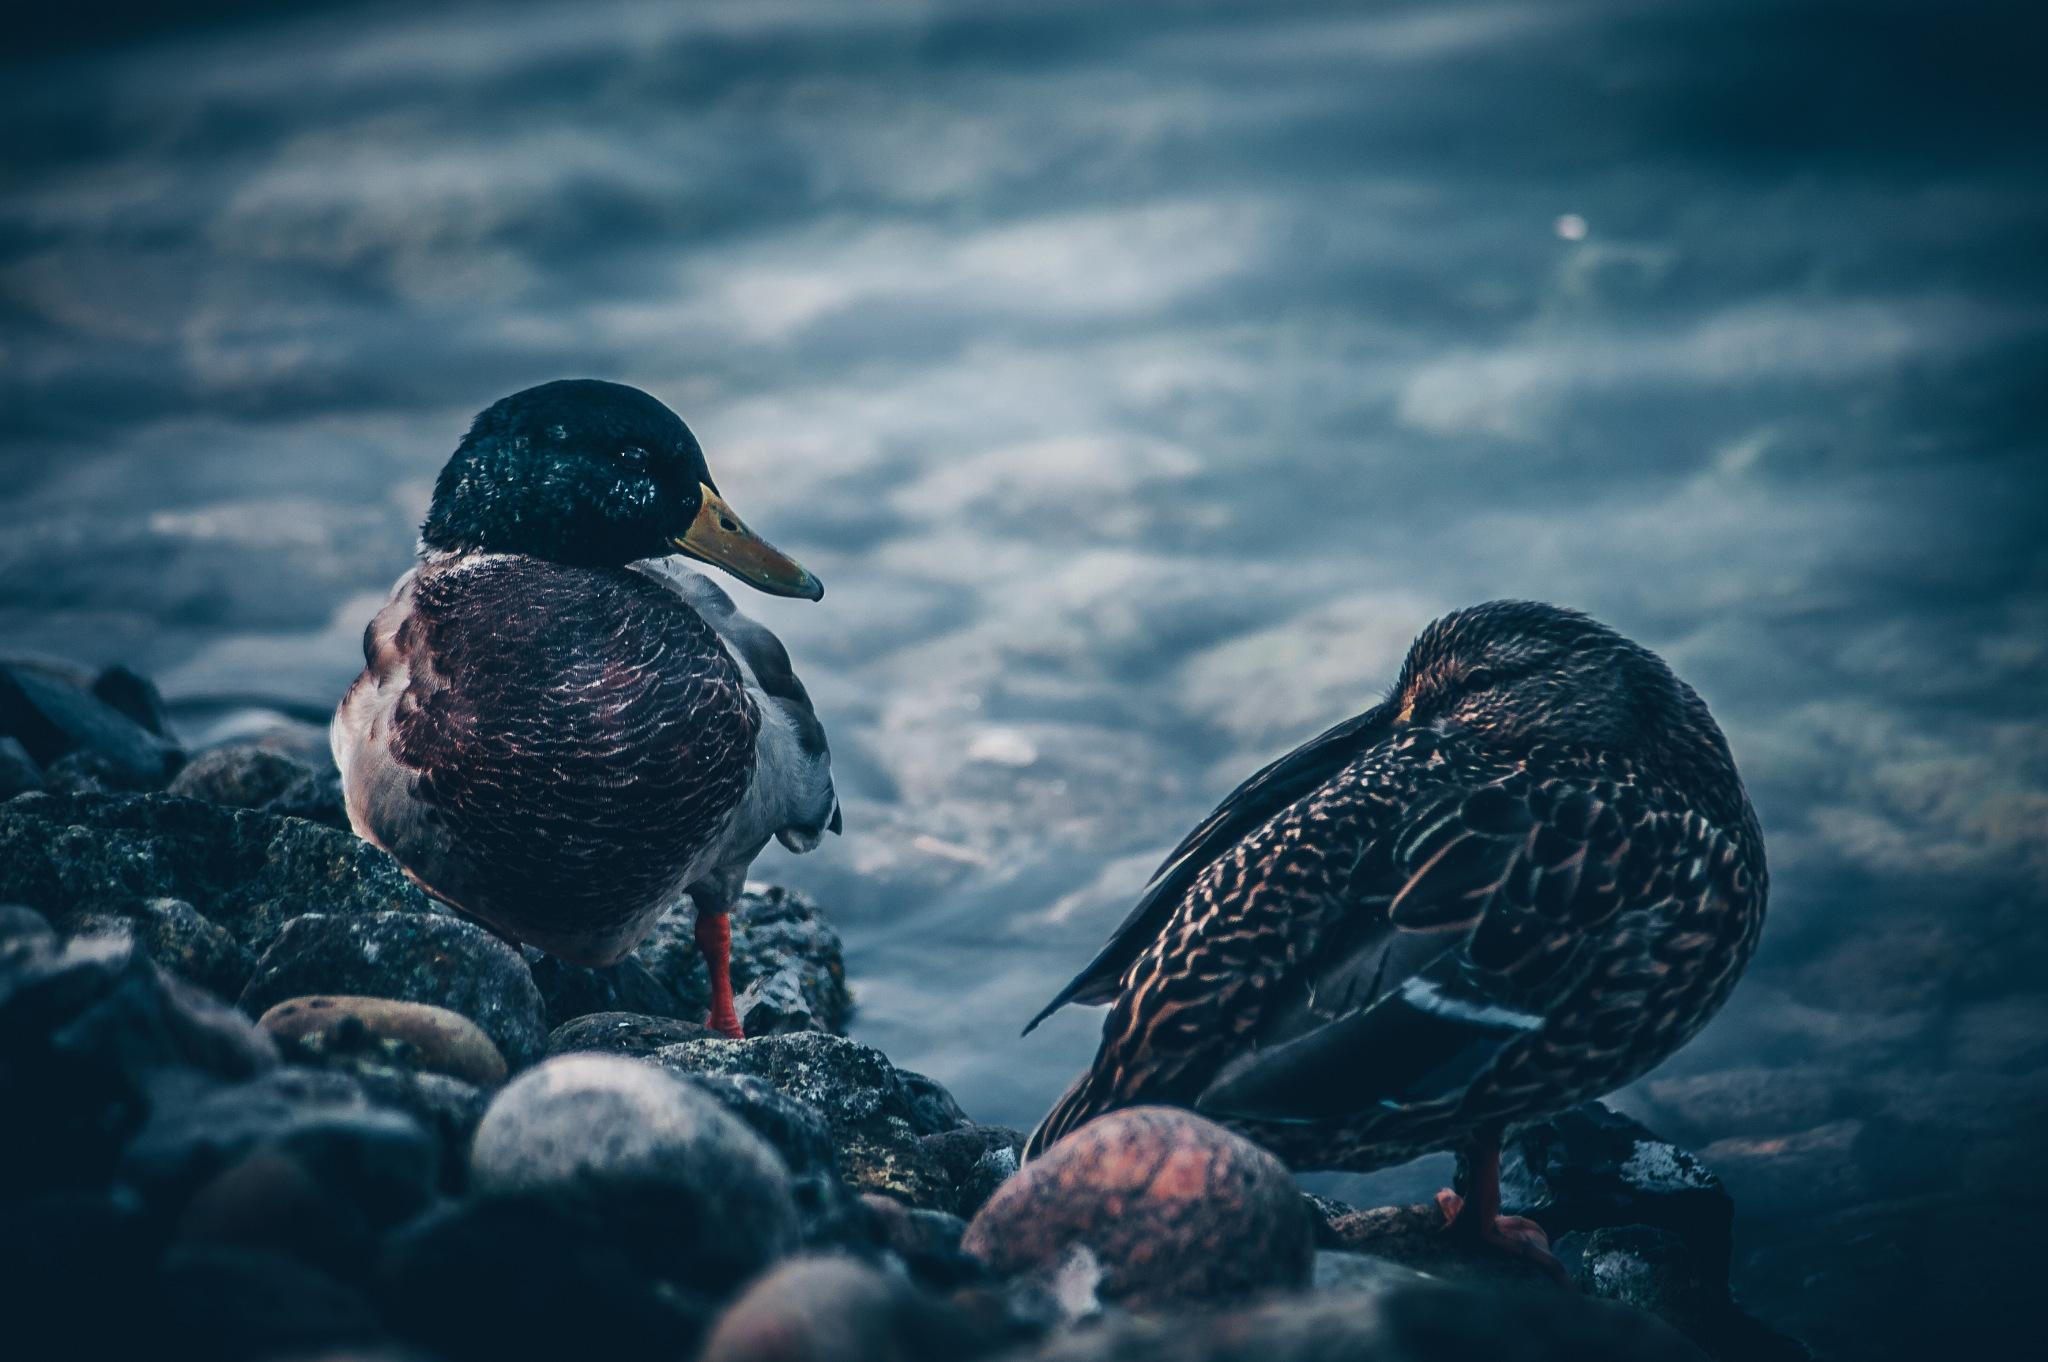 Ducks in cobalt by antonia kofod